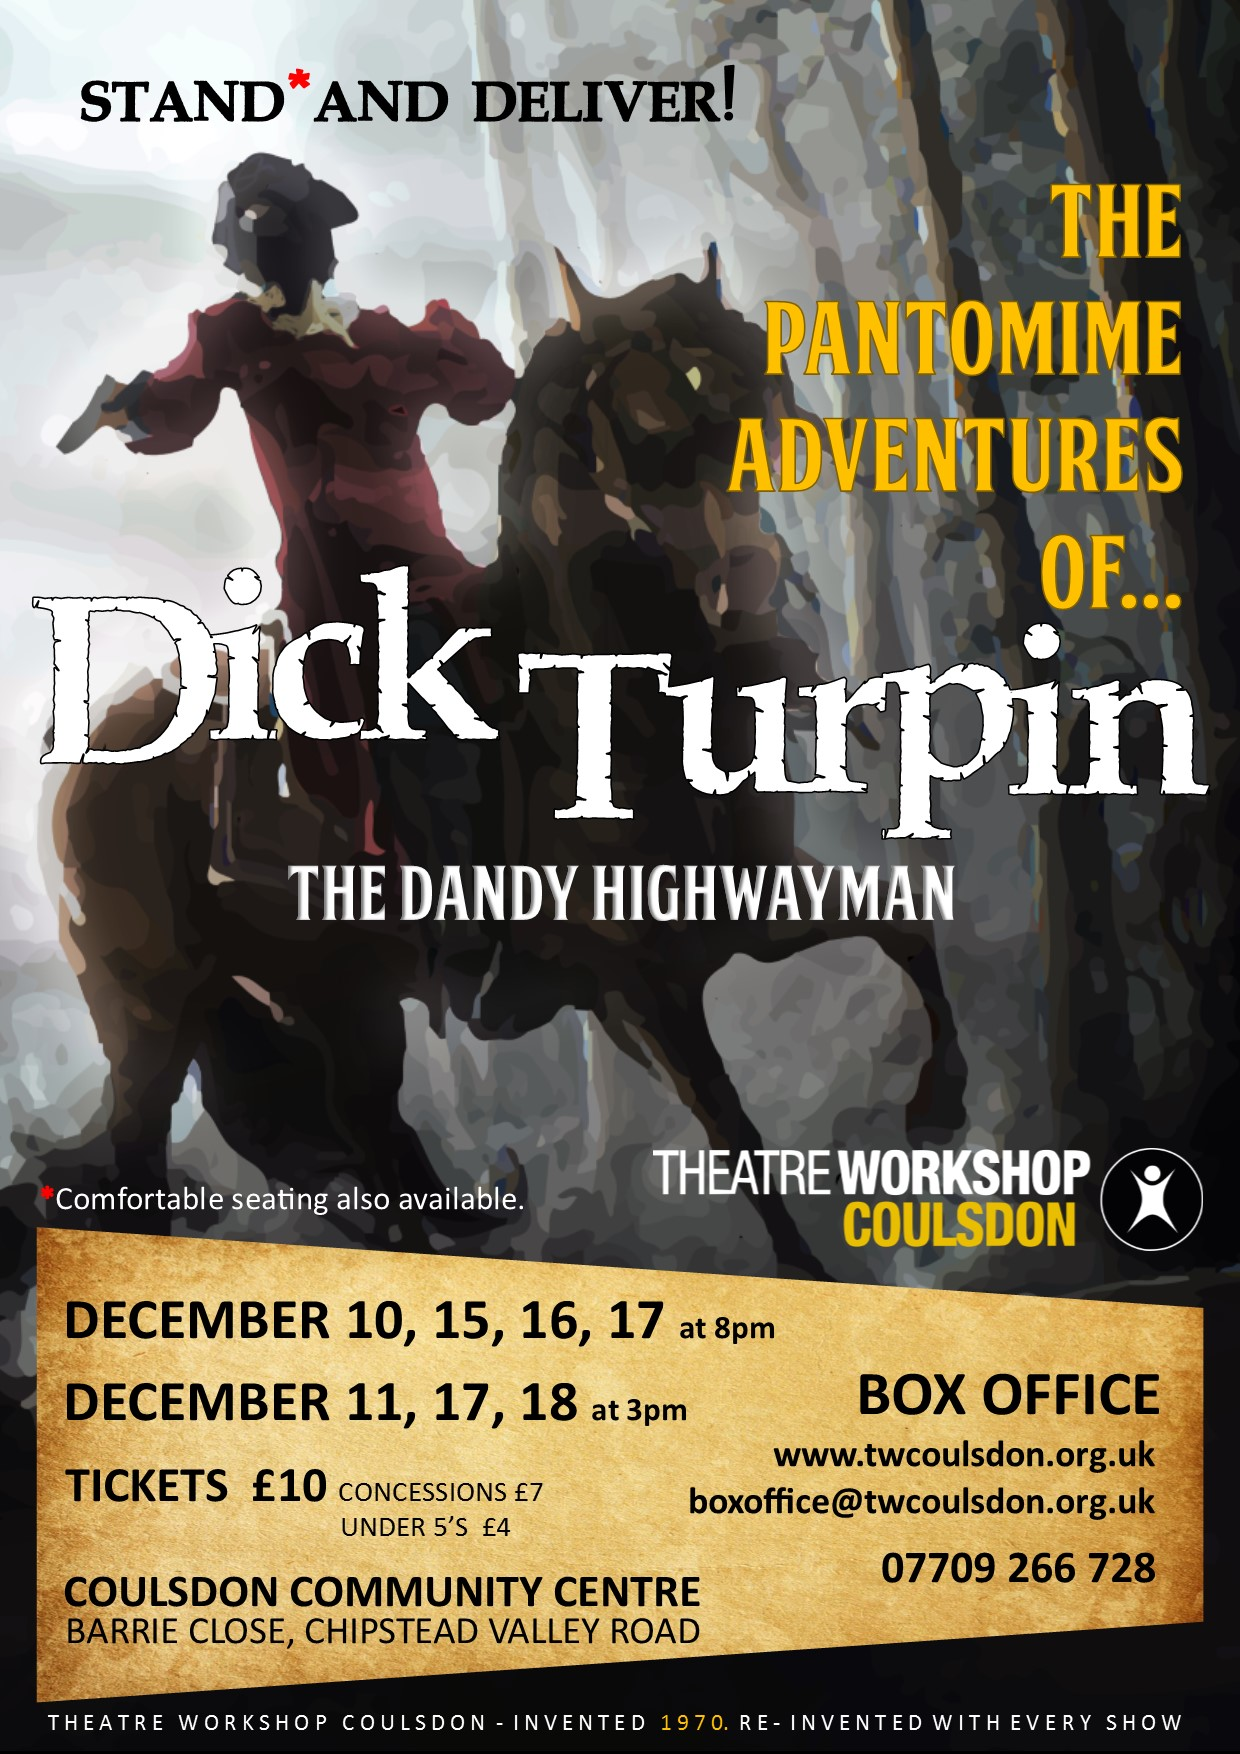 dick-turpin-poster-draft-v1-31